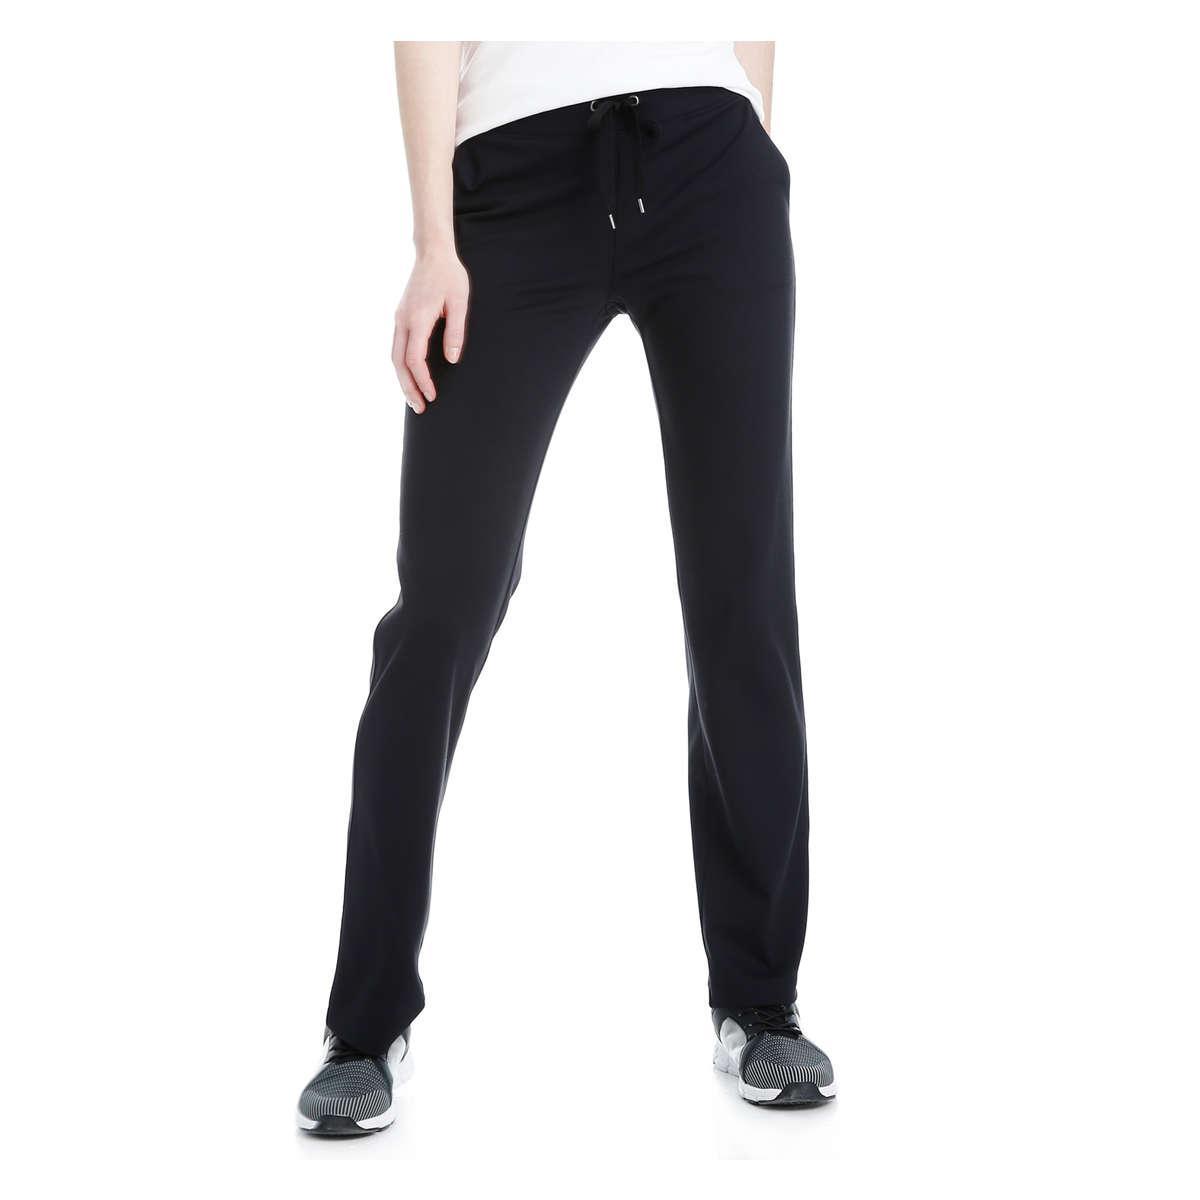 Joe Fresh Yoga Active Pant In Black